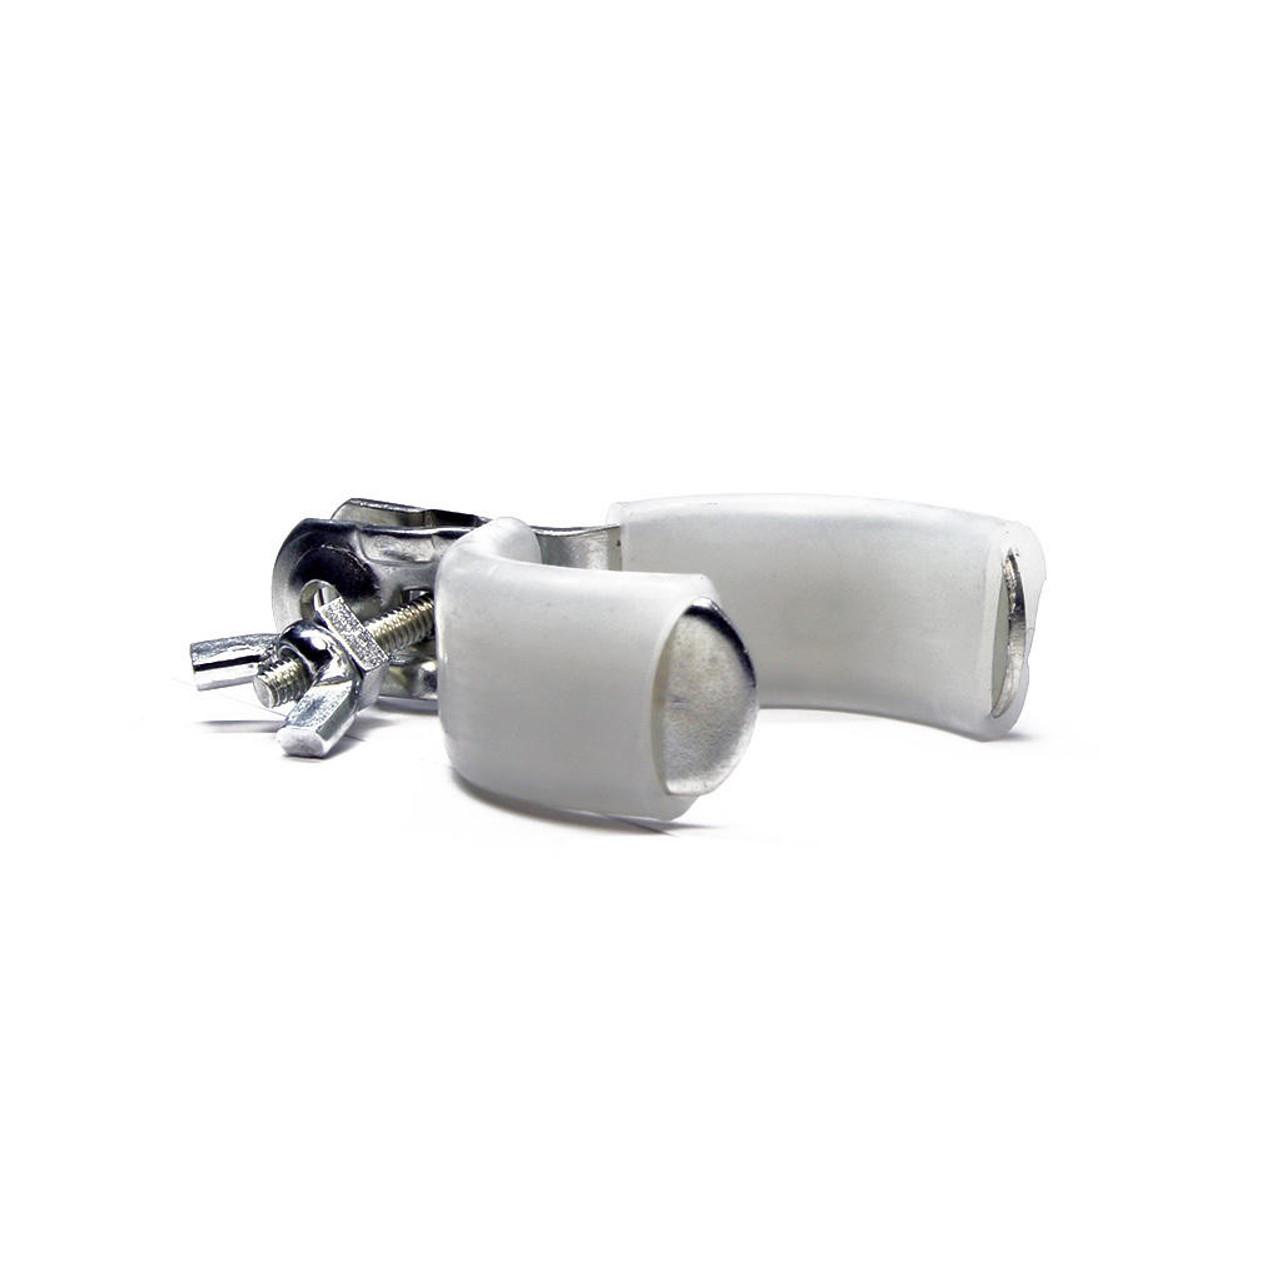 Arcadia ARCADIA GRAPHITE CERAMIC DOME REFLECTOR CLAMP LAMP 140mm / 5.5″ CDN/USA PLUG